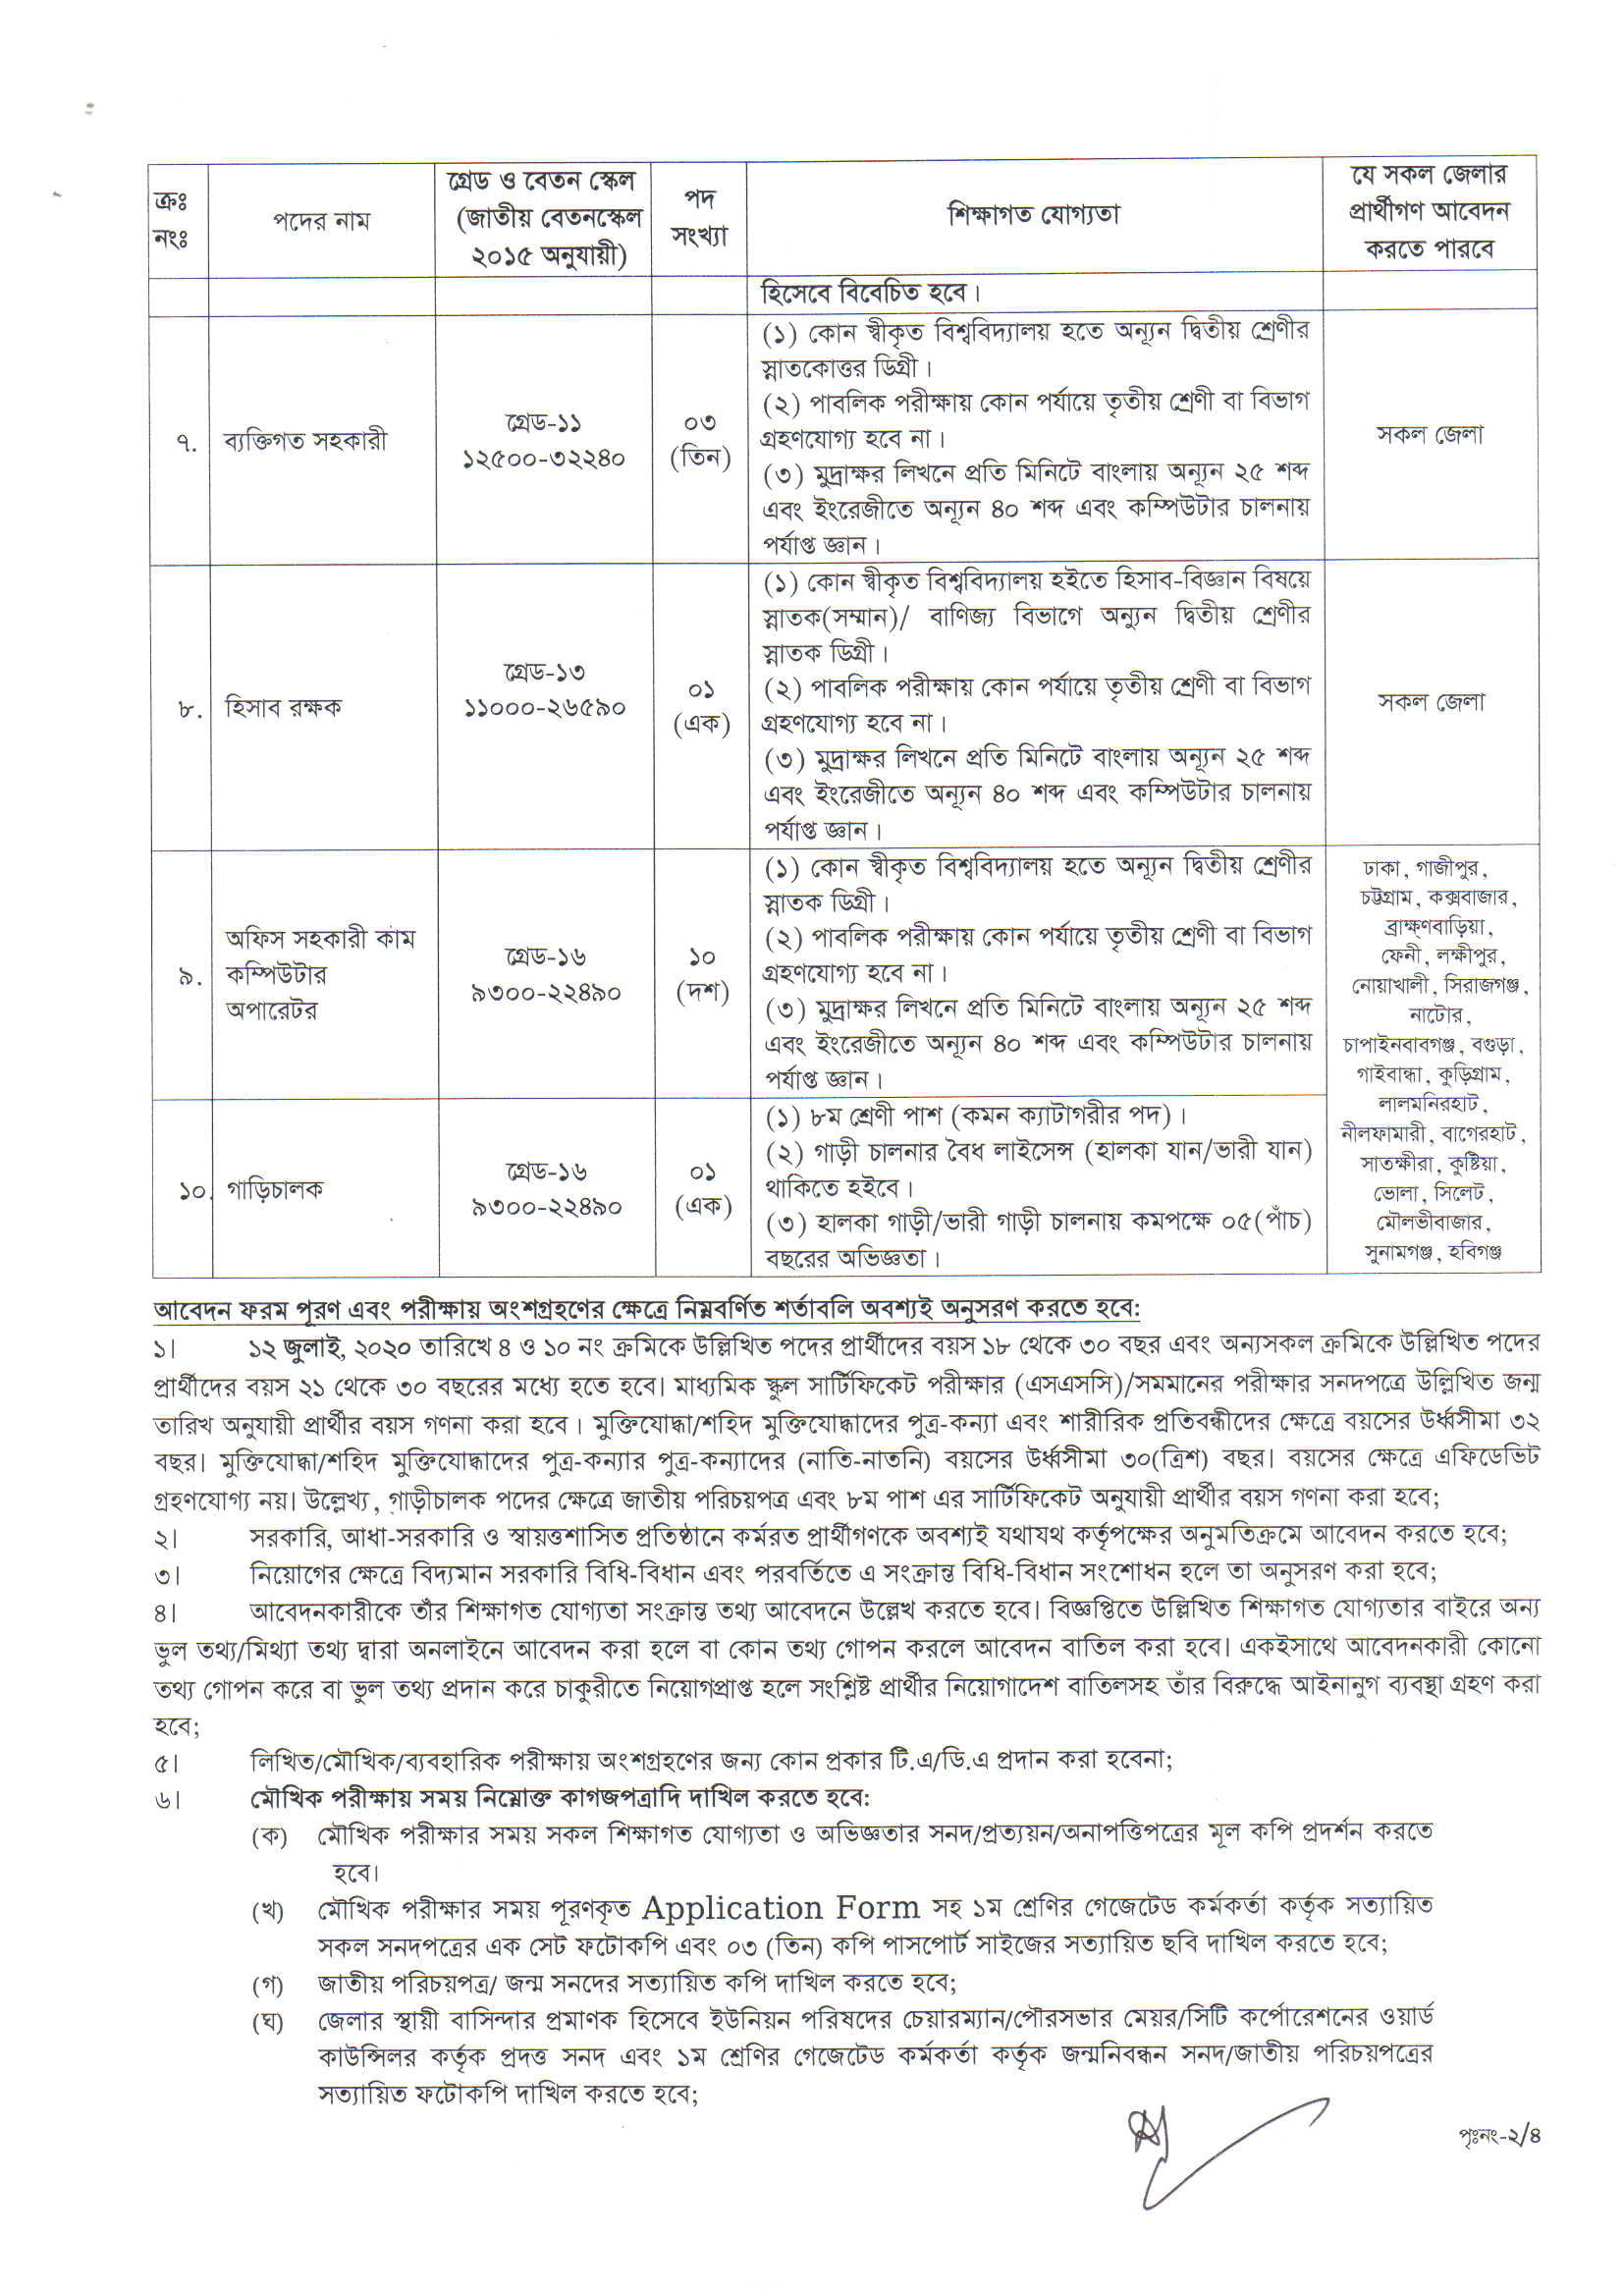 BTRC Recruitment Circular-2020-2